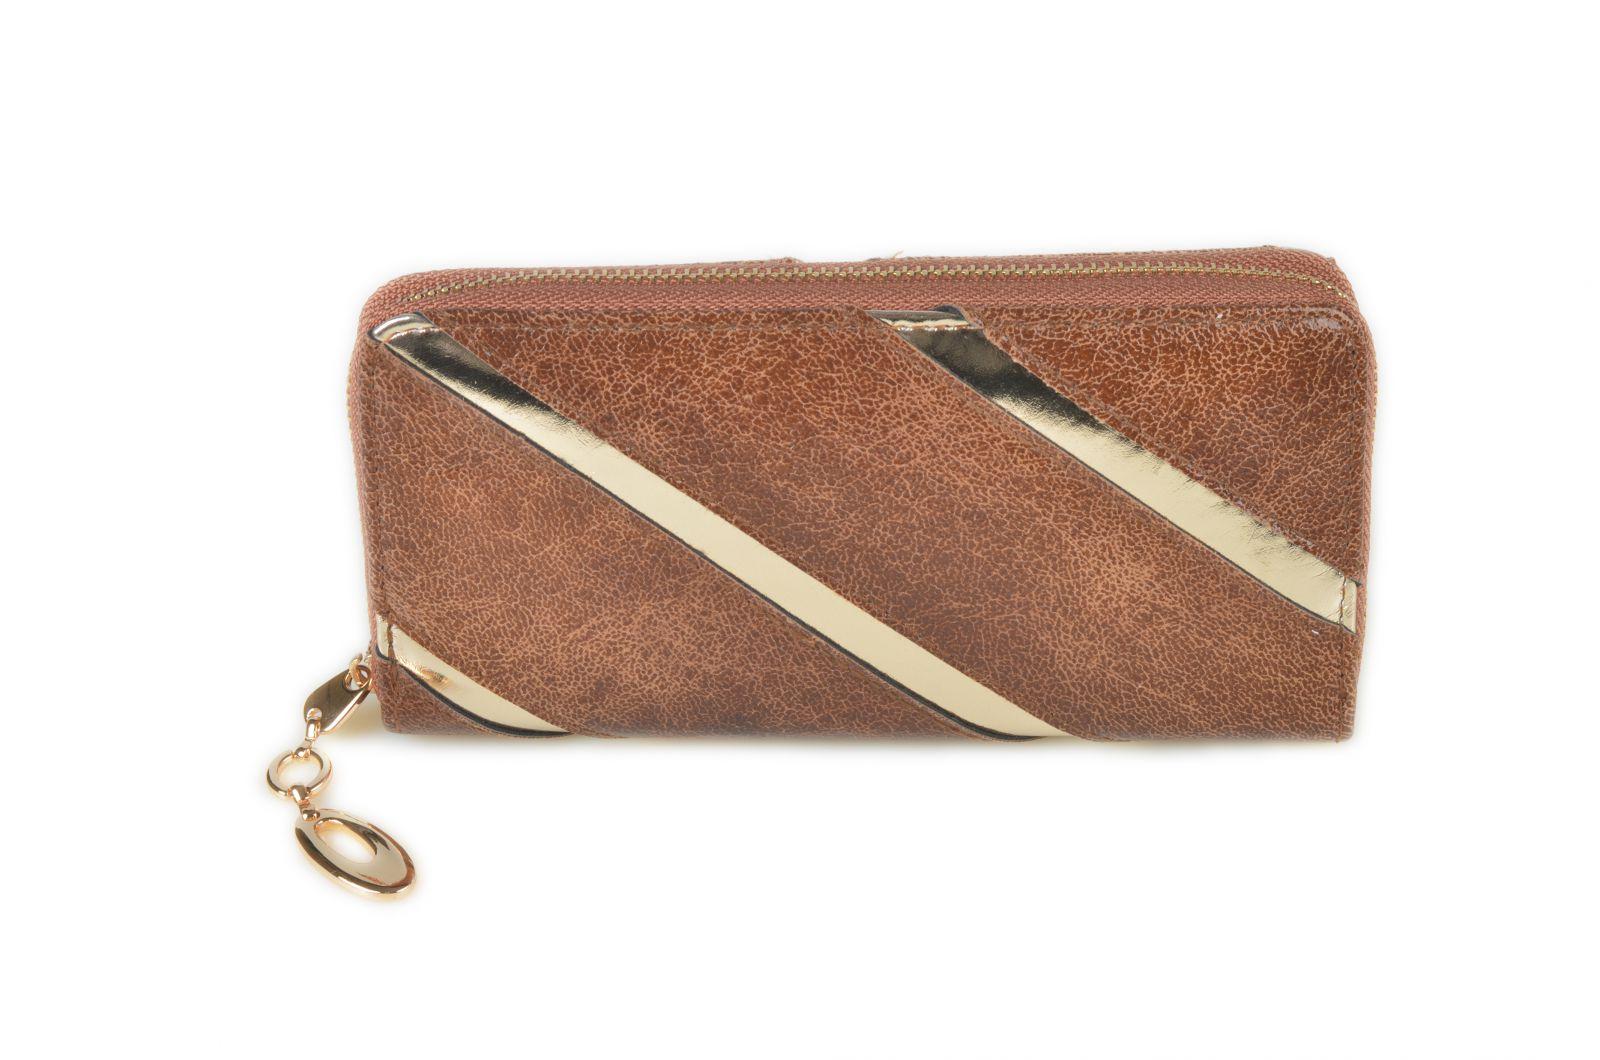 Dámská peněženka ESLEE 1-310 khaki E-batoh